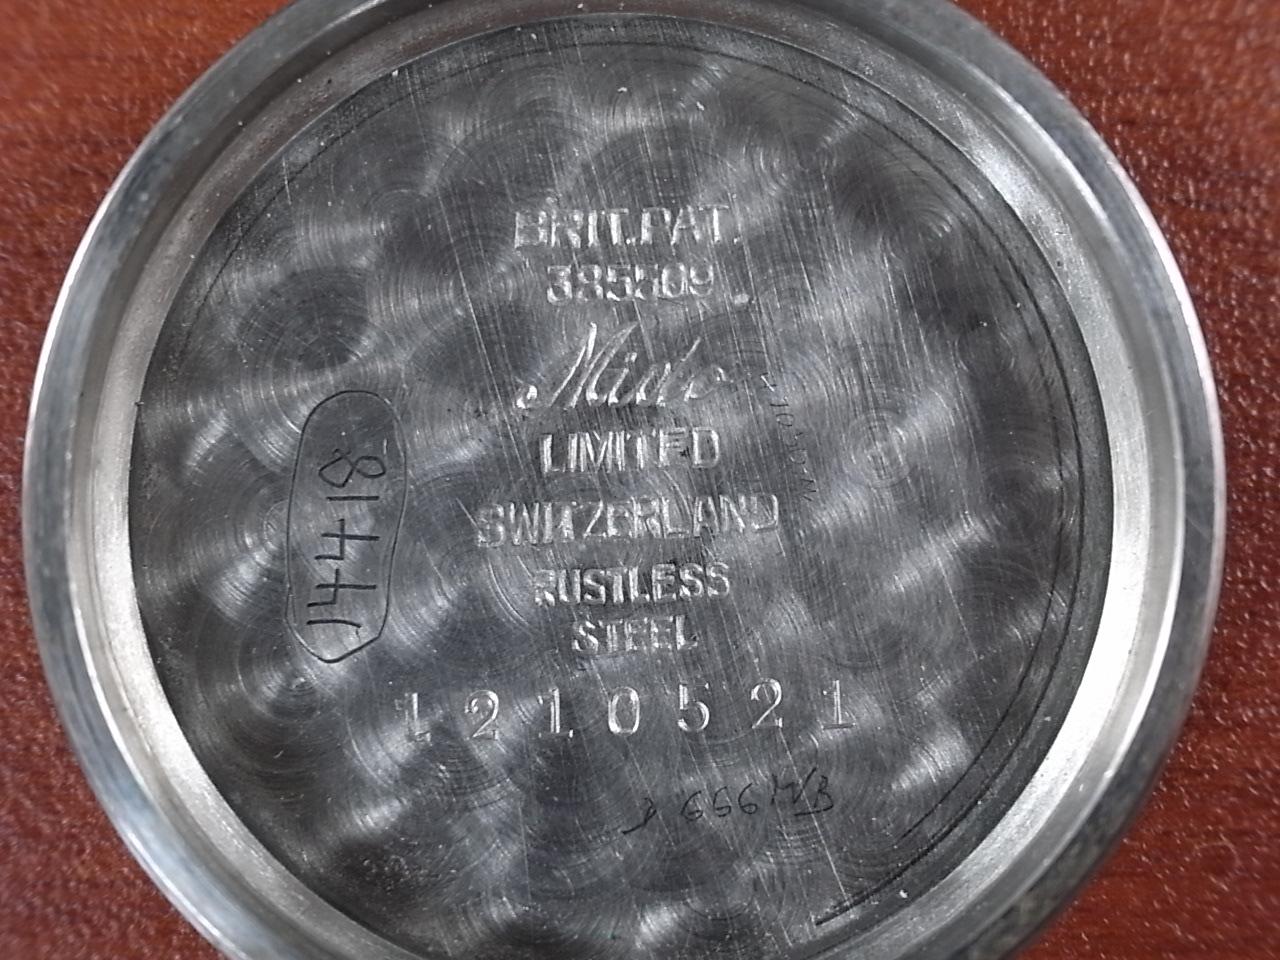 MIDO ミドー マルチフォート コンビ カッパーハチマキ ローマンインデックスの写真6枚目